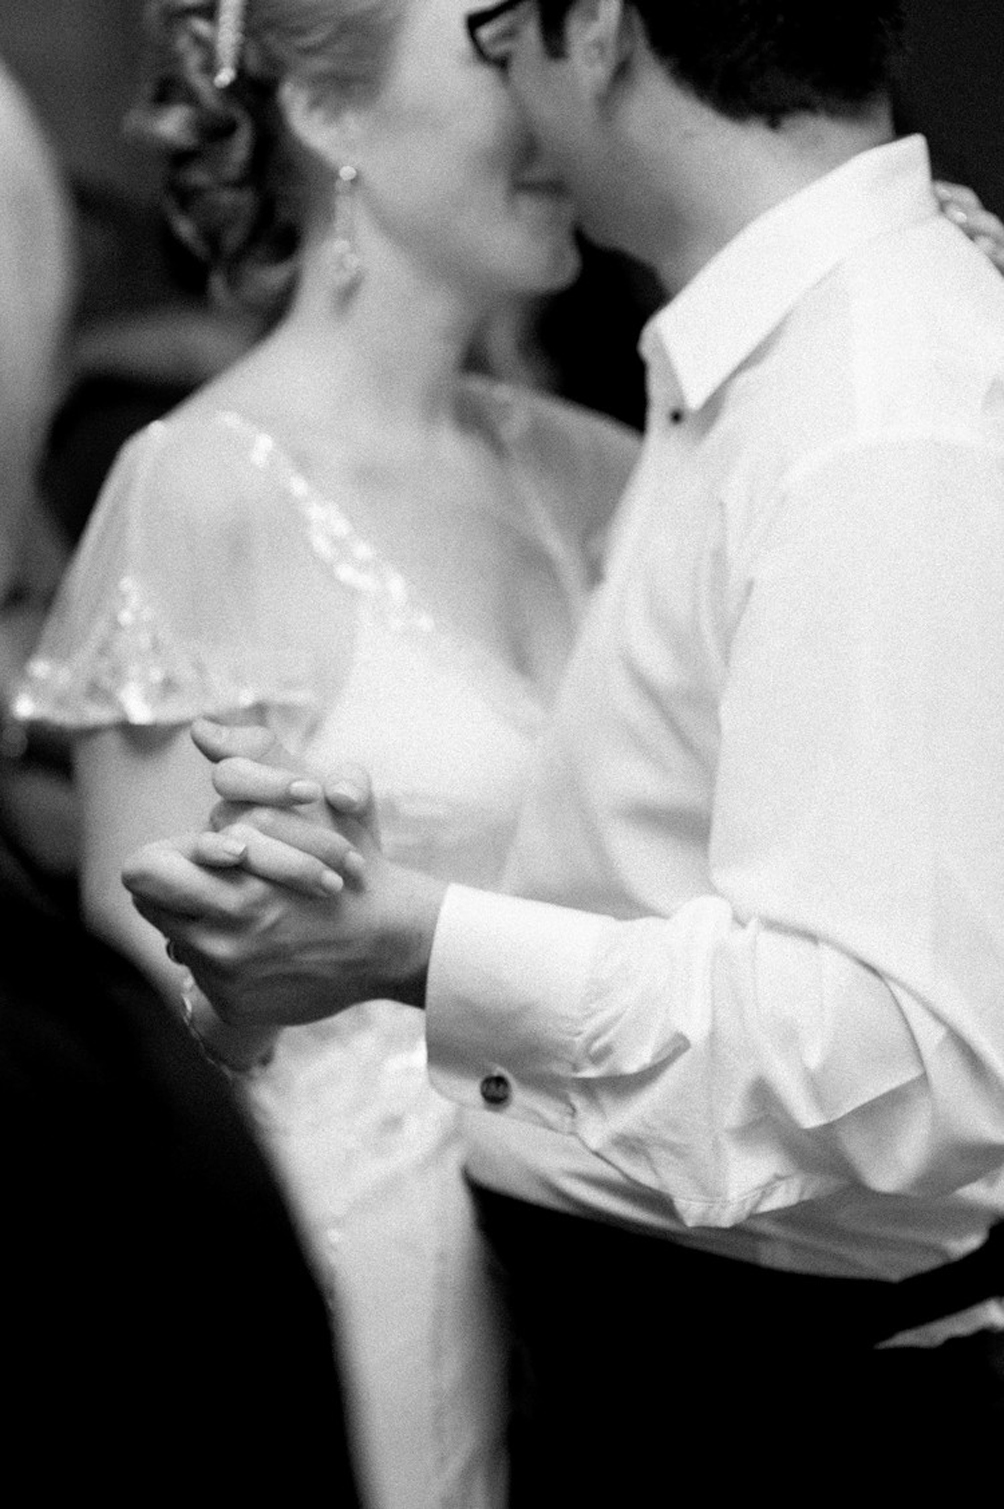 first dance wedding photo ideas